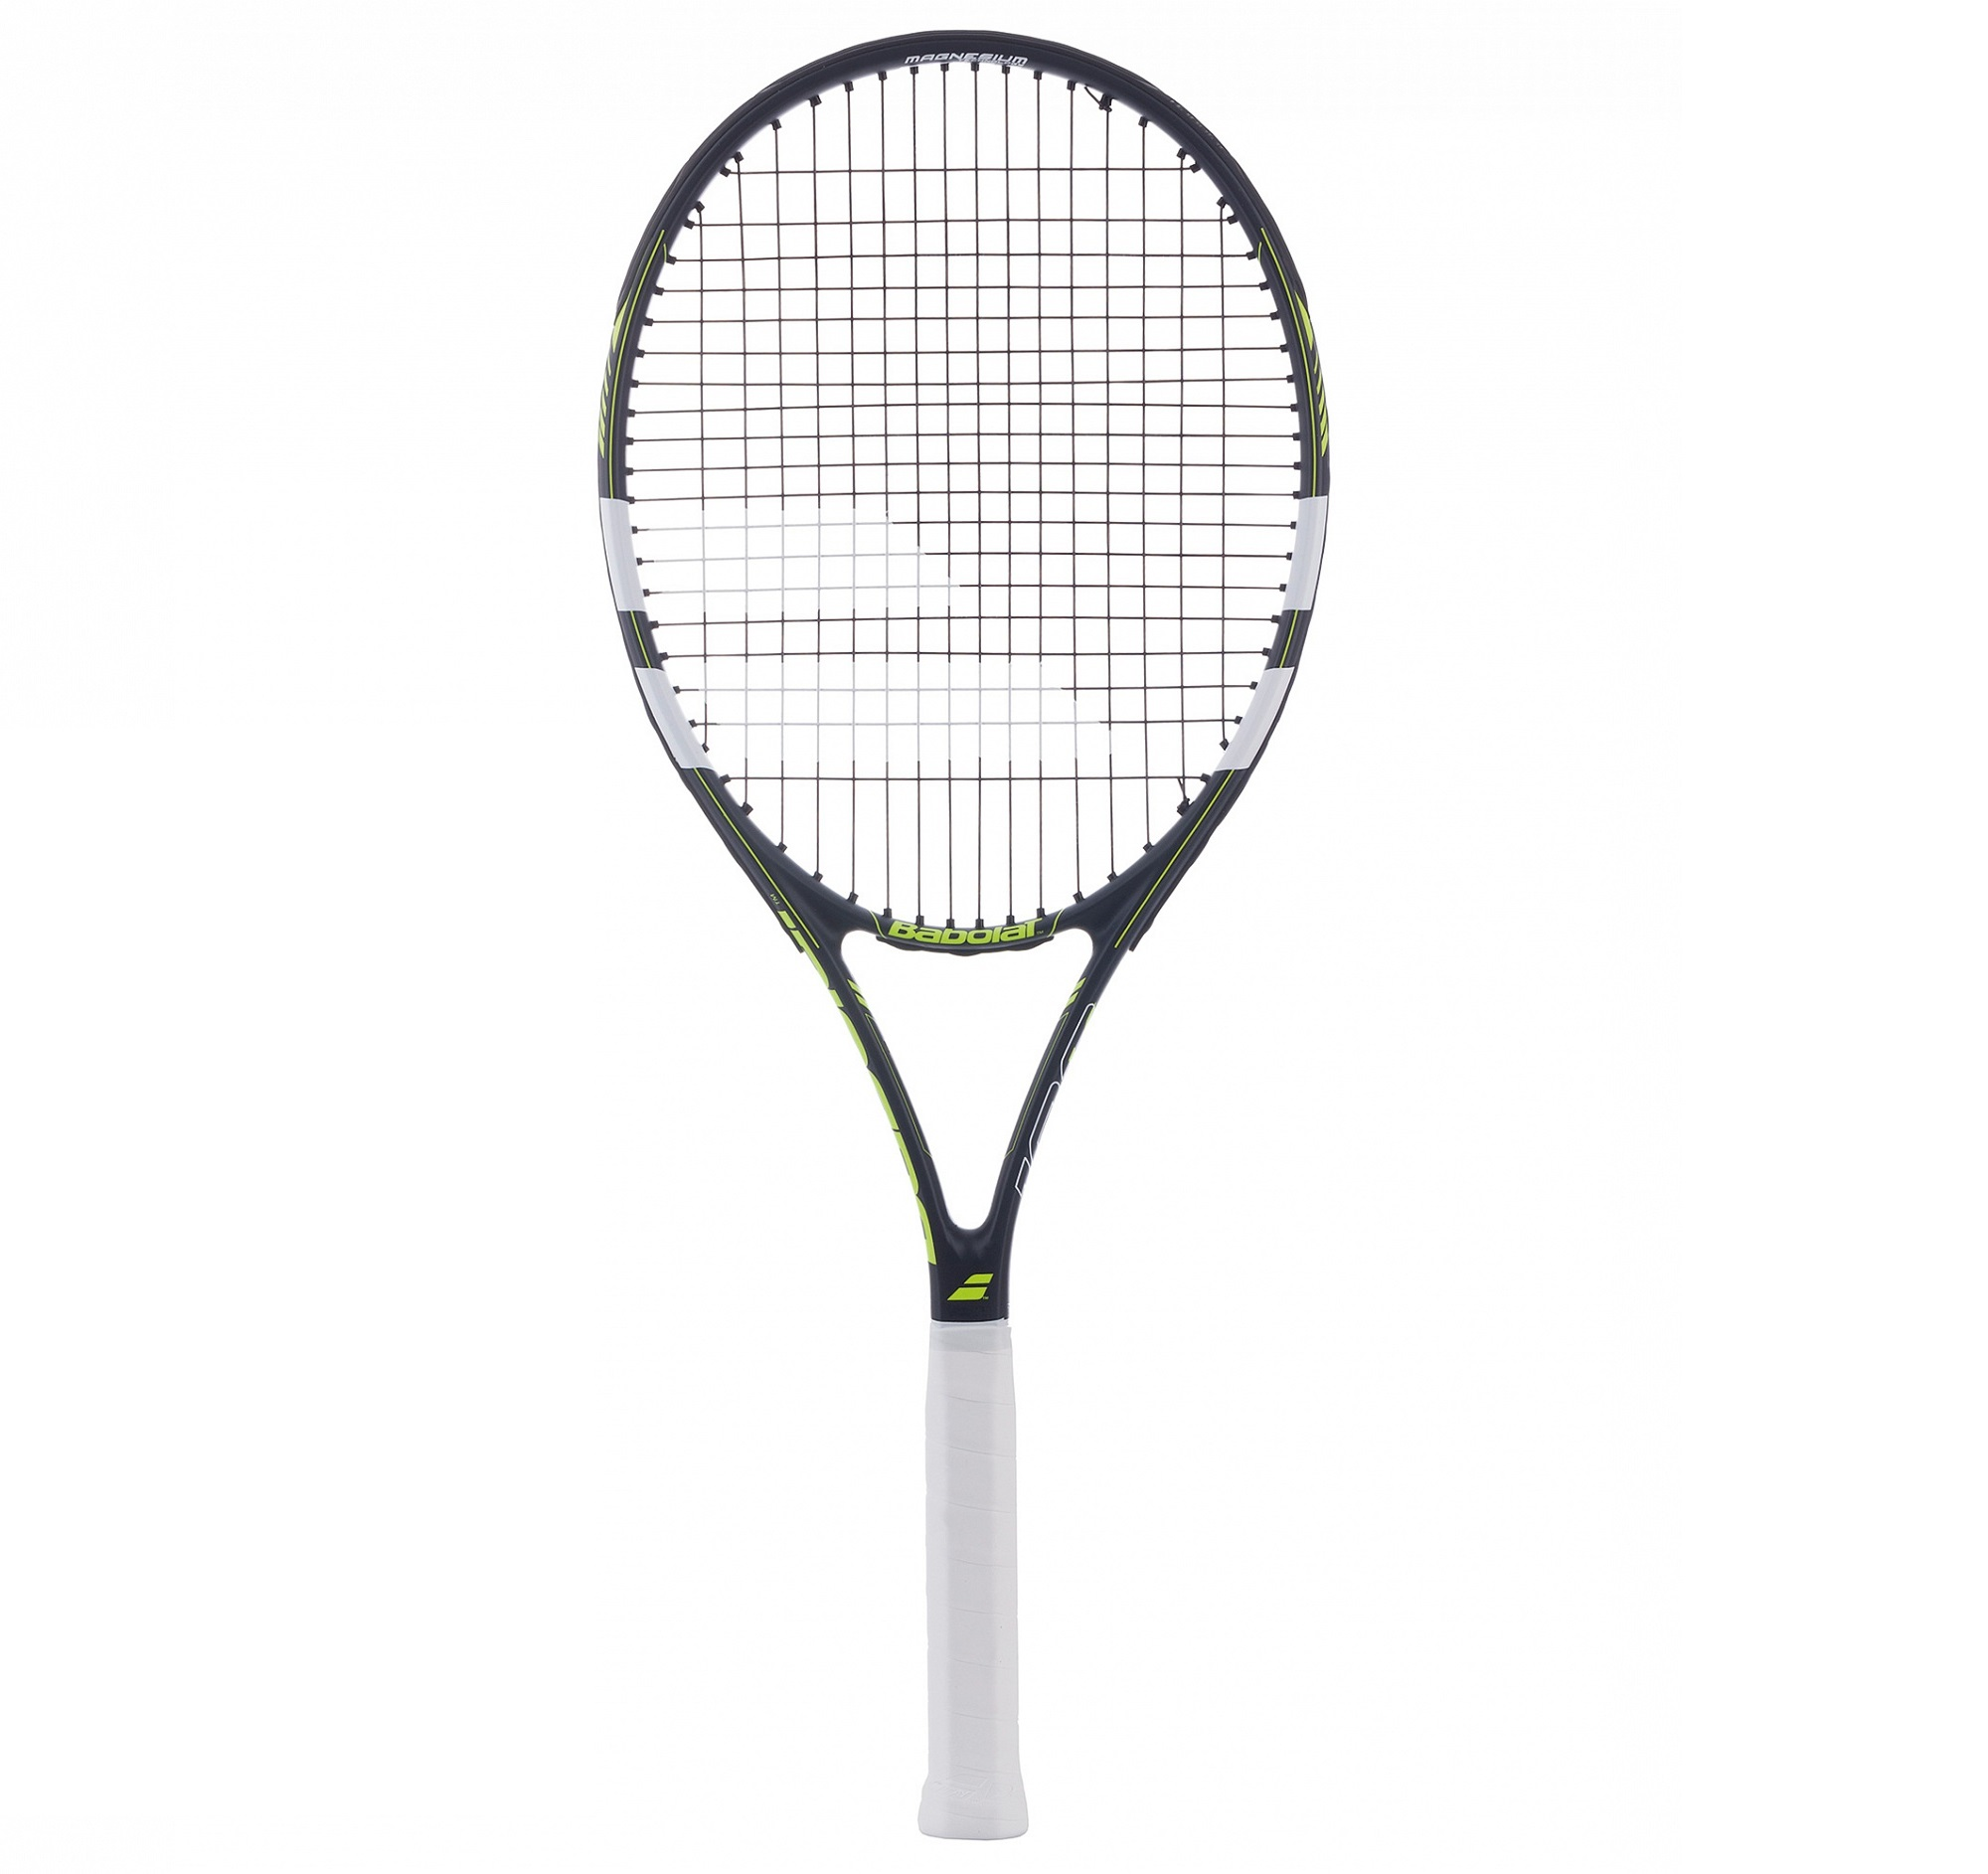 Babolat Ракетка для большого тенниса Evoke 102